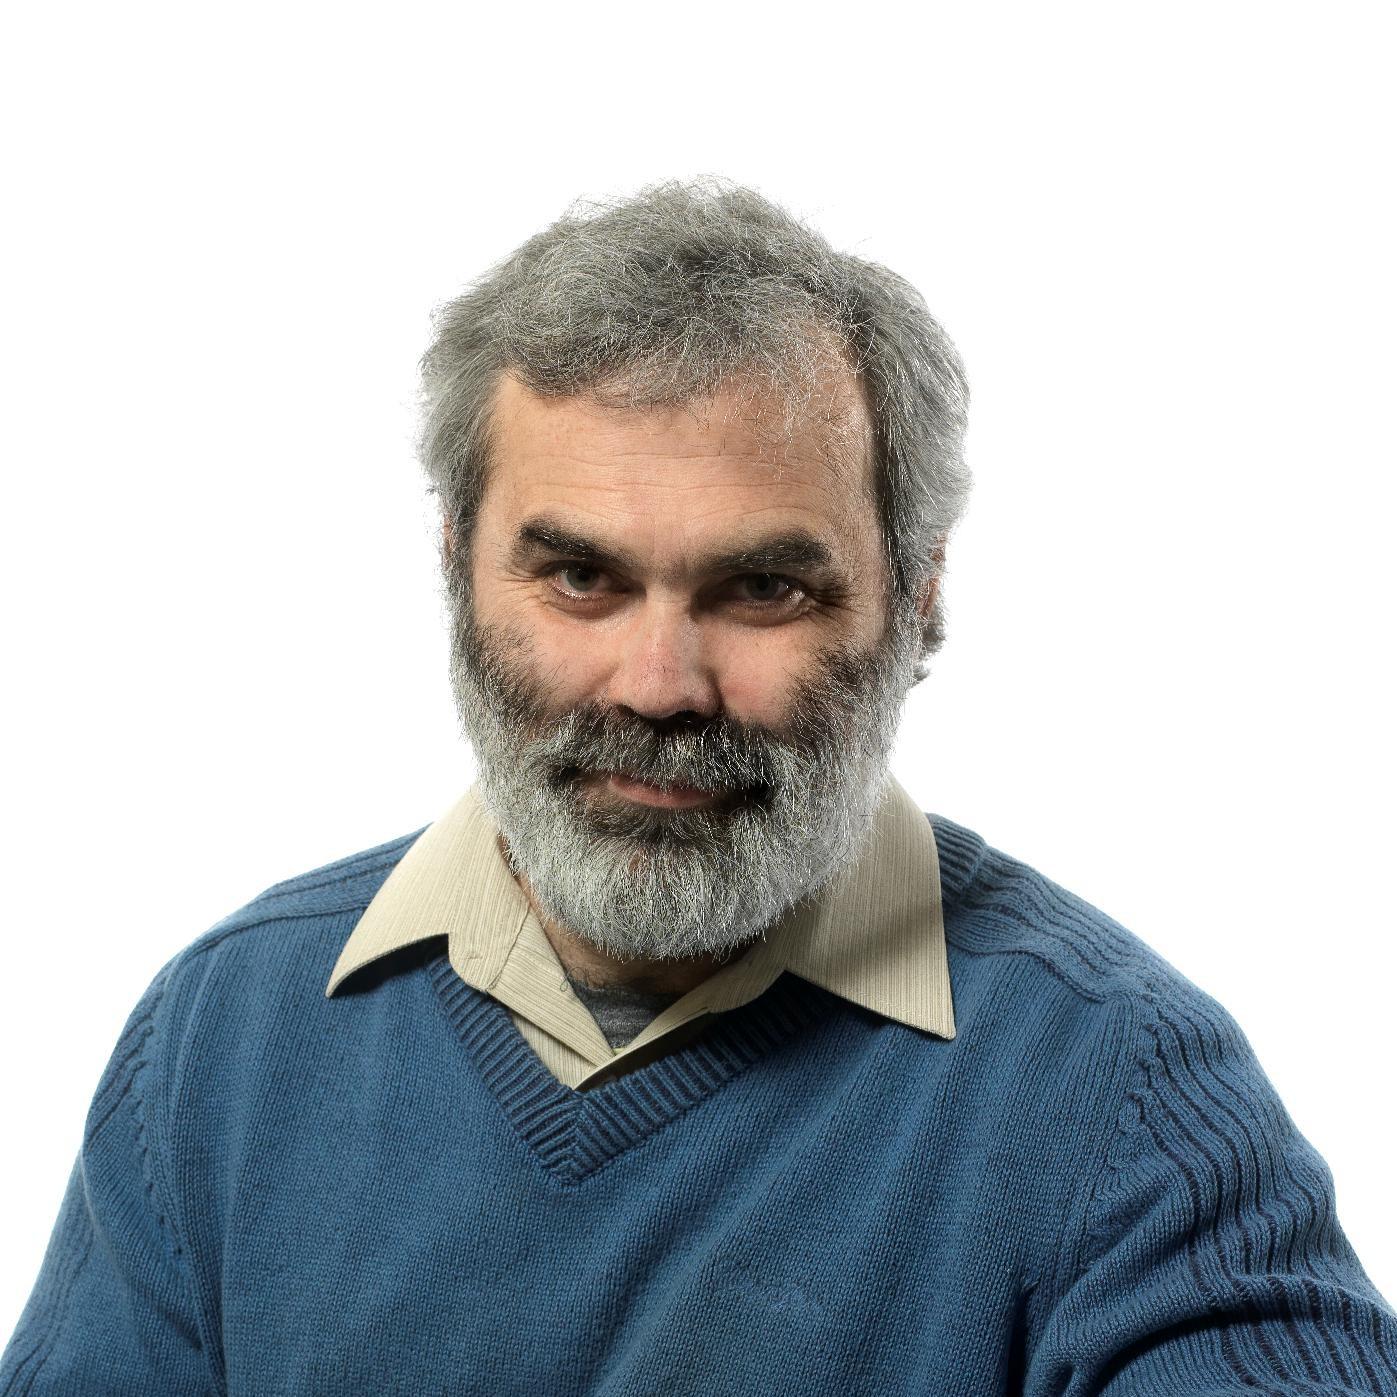 15. Vladimír Buřt Profile Image